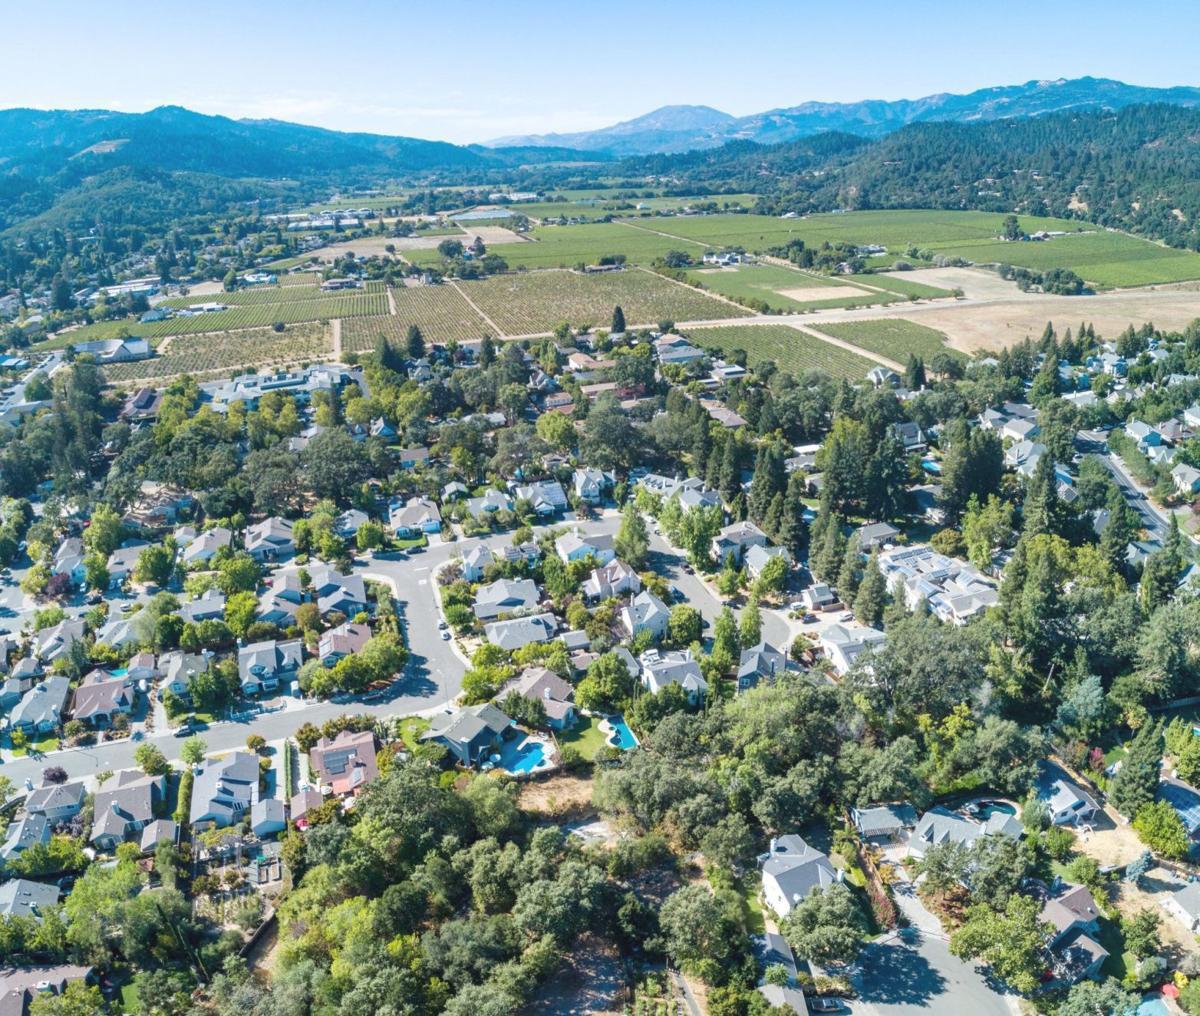 St. Helena subdivision